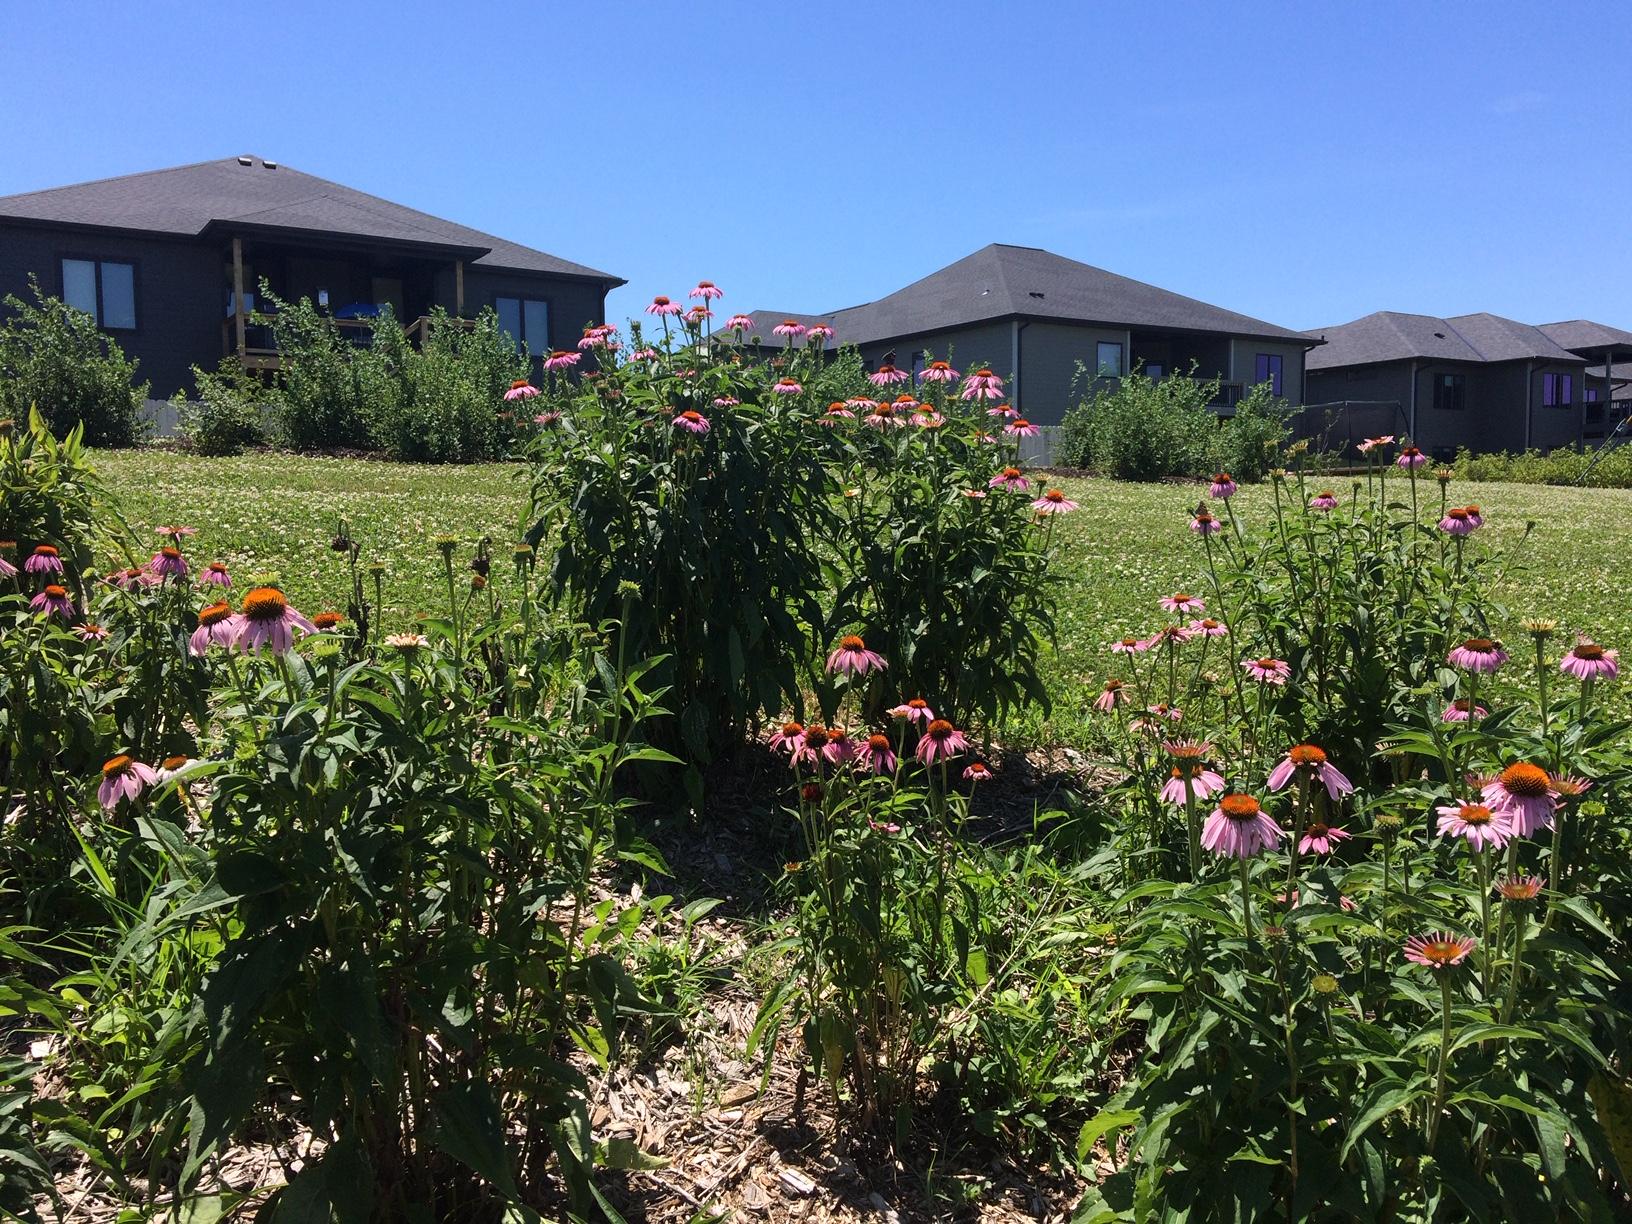 Nebraska Arboretum Honors Us with Visit!